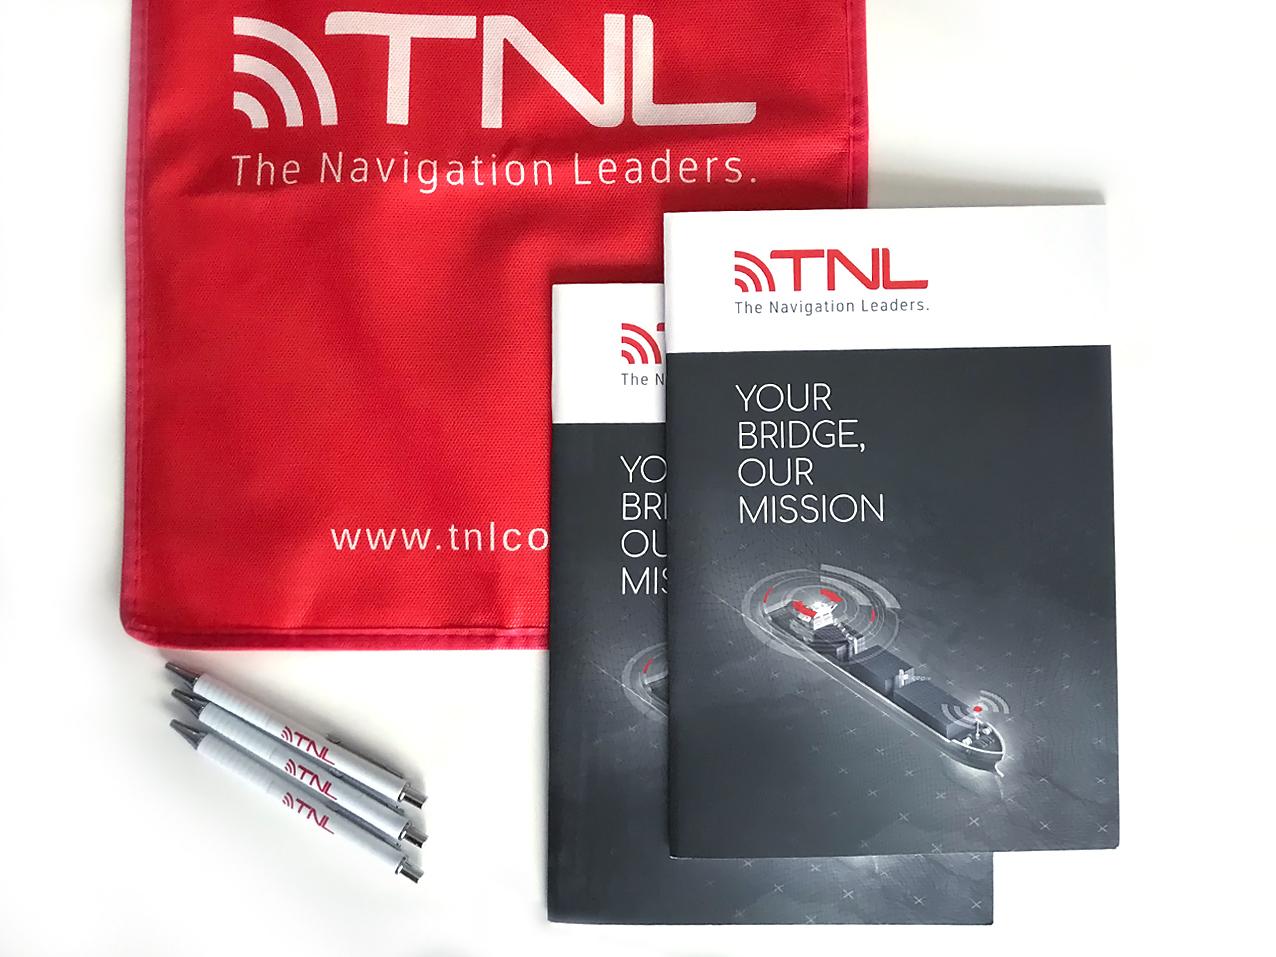 TNL Group printed catalogues, bag and pens